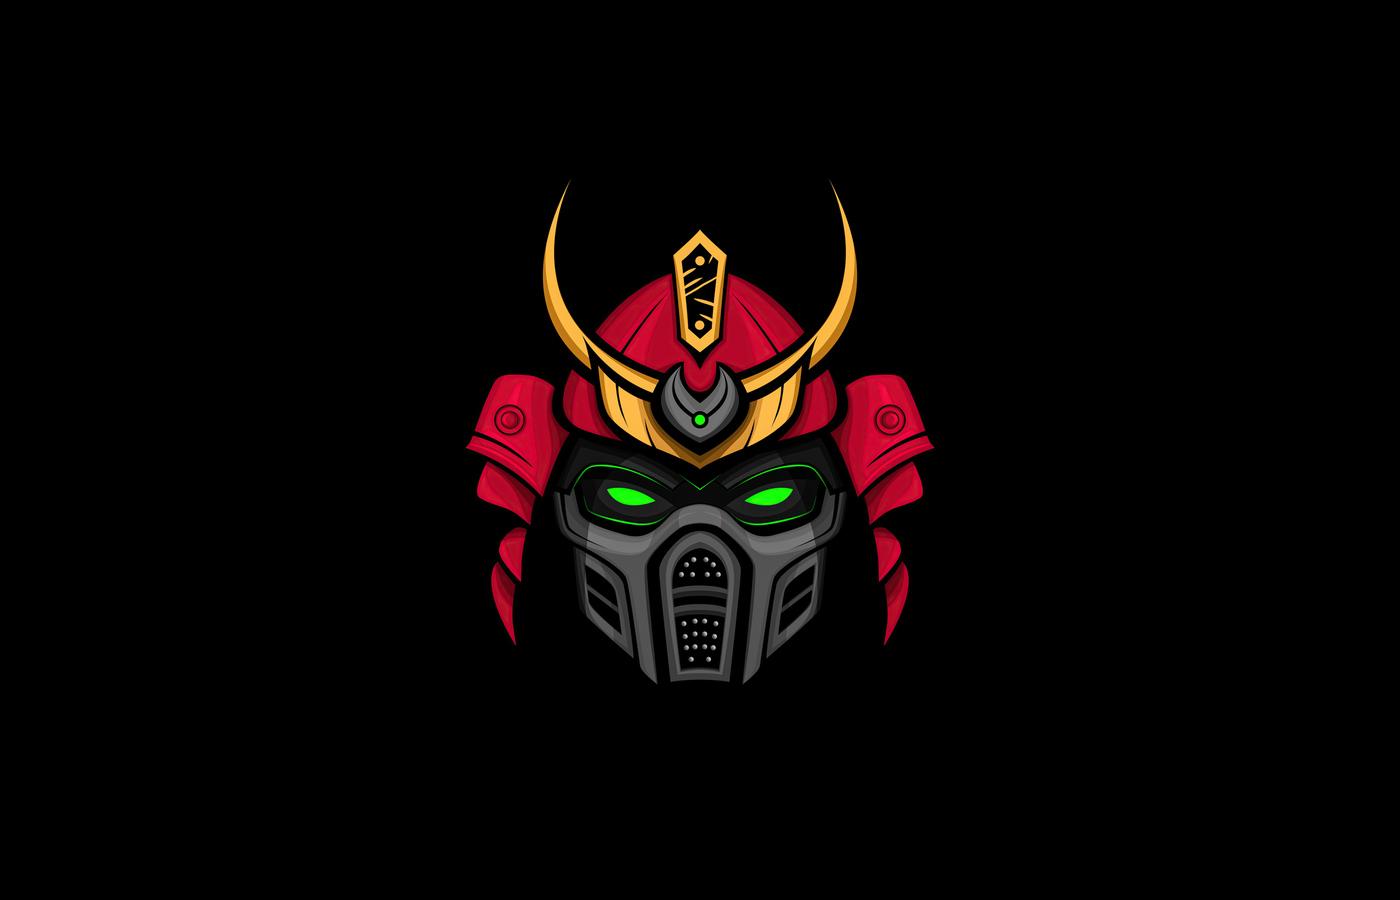 viking-helmet-minimal-dark-4k-r7.jpg